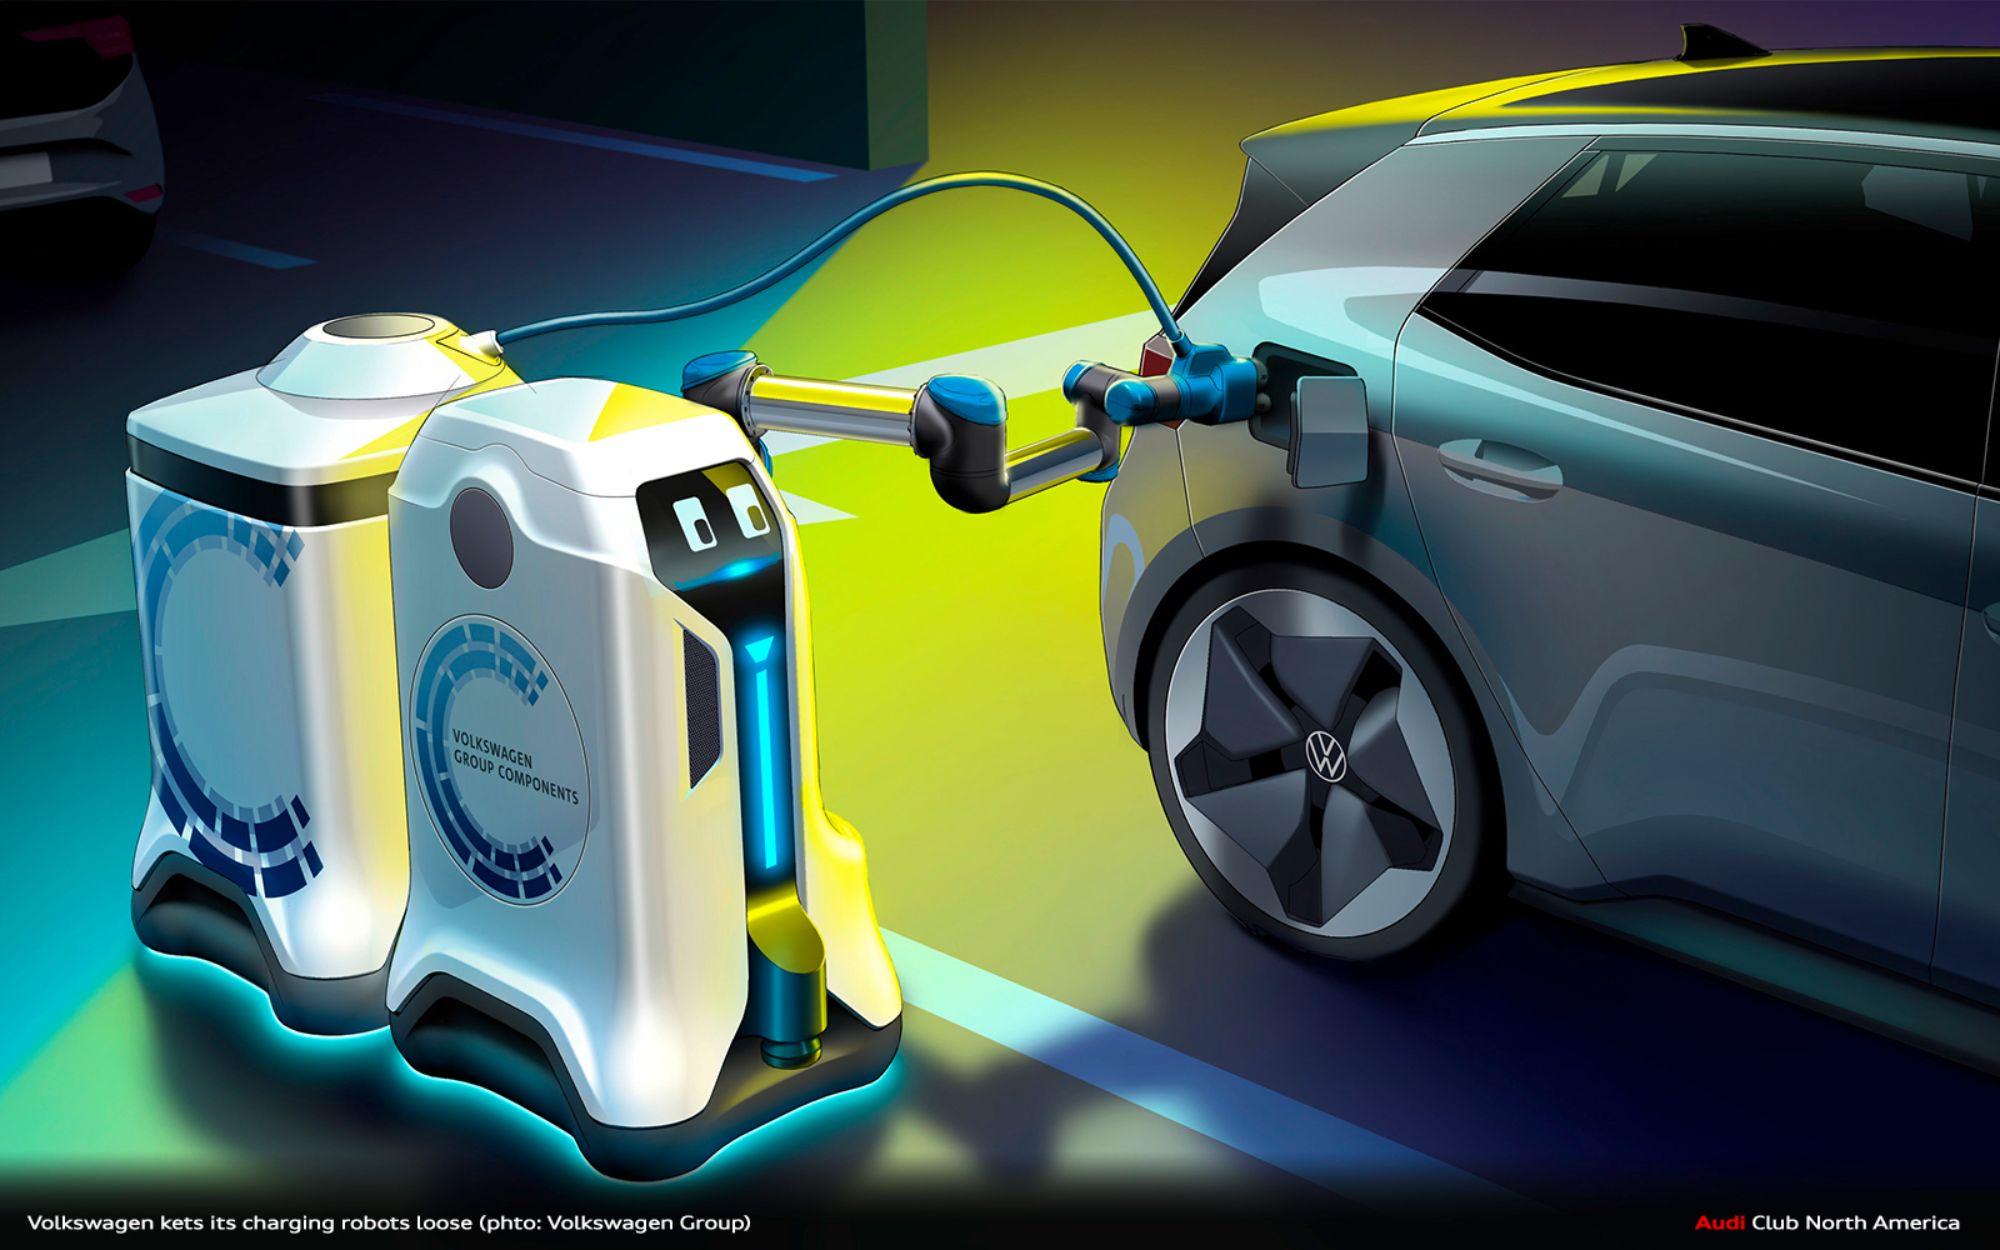 World Premiere: Revolution In The Underground Park - Volkswagen Lets Its Charging Robots Loose